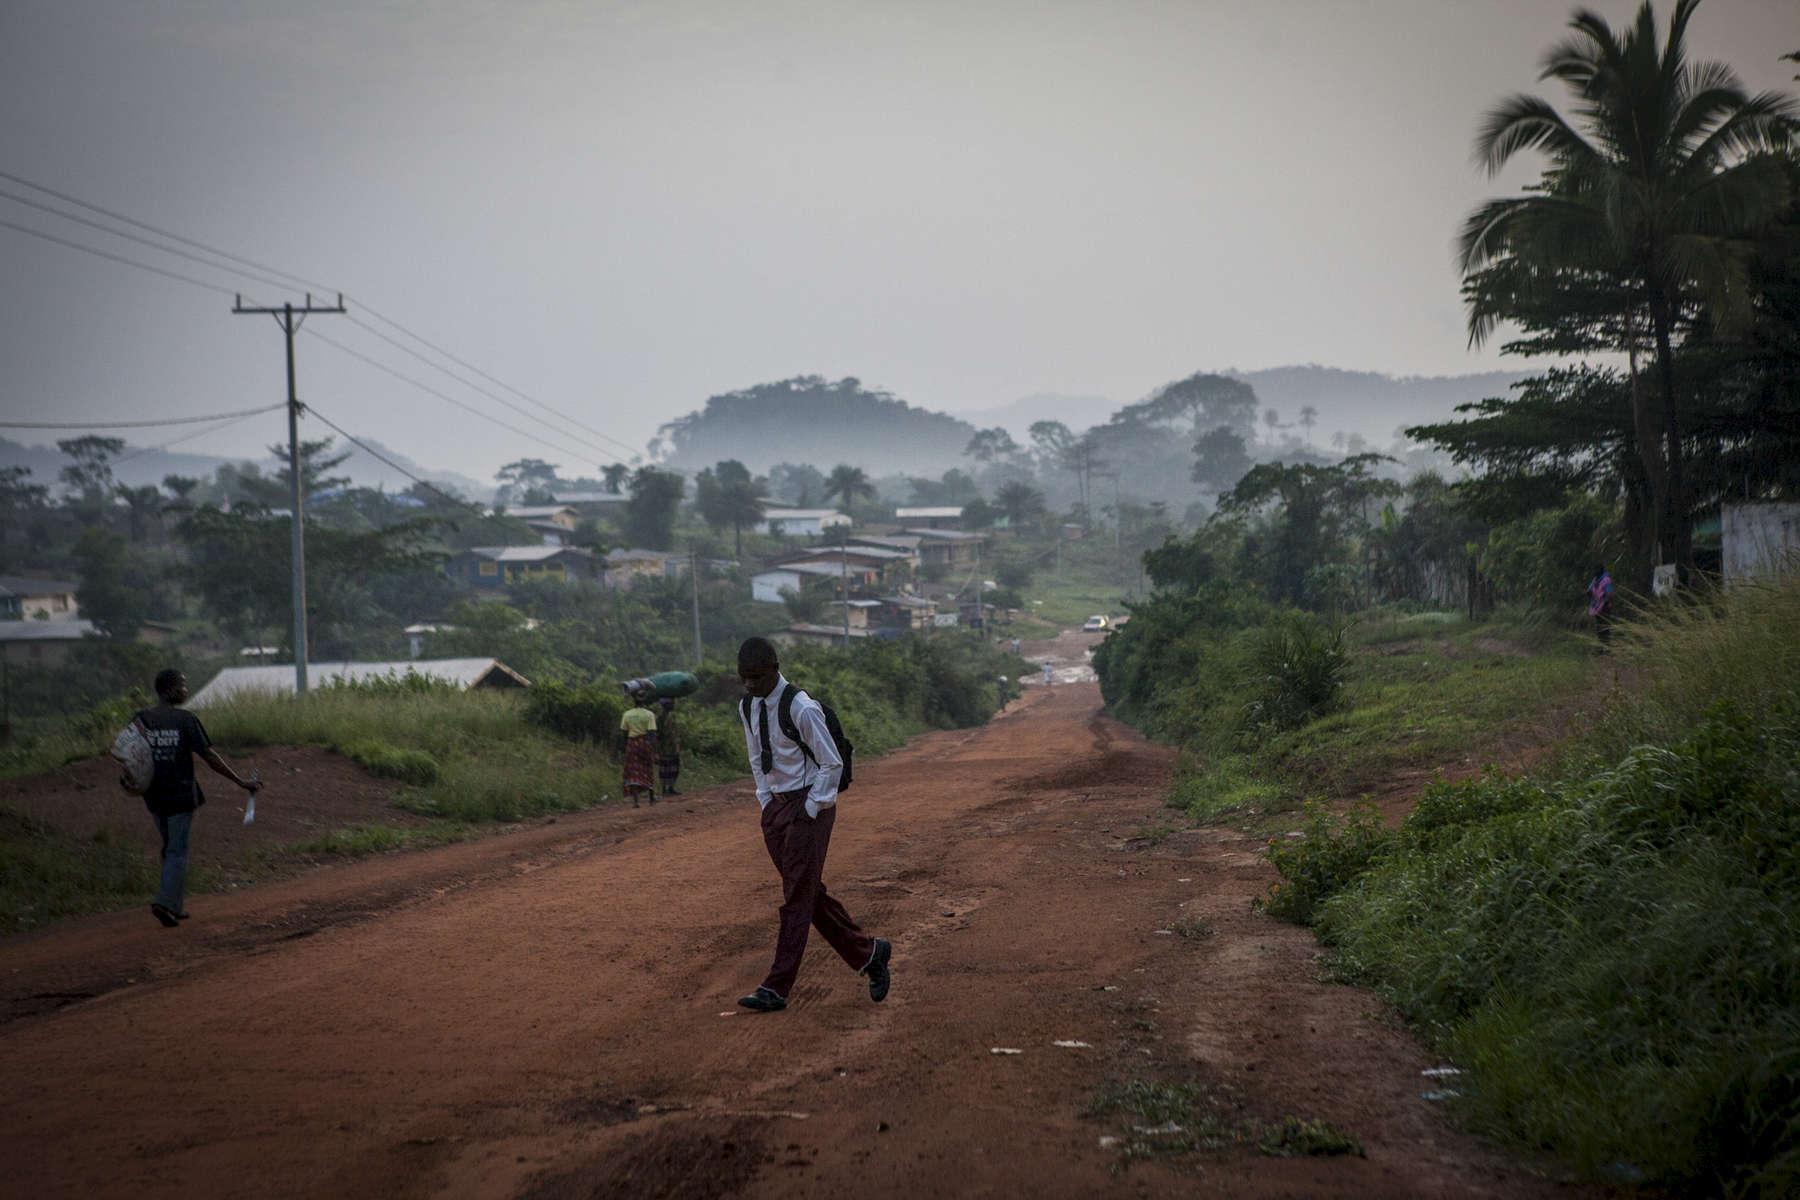 A boy walks to school in Nimba County, Liberia.